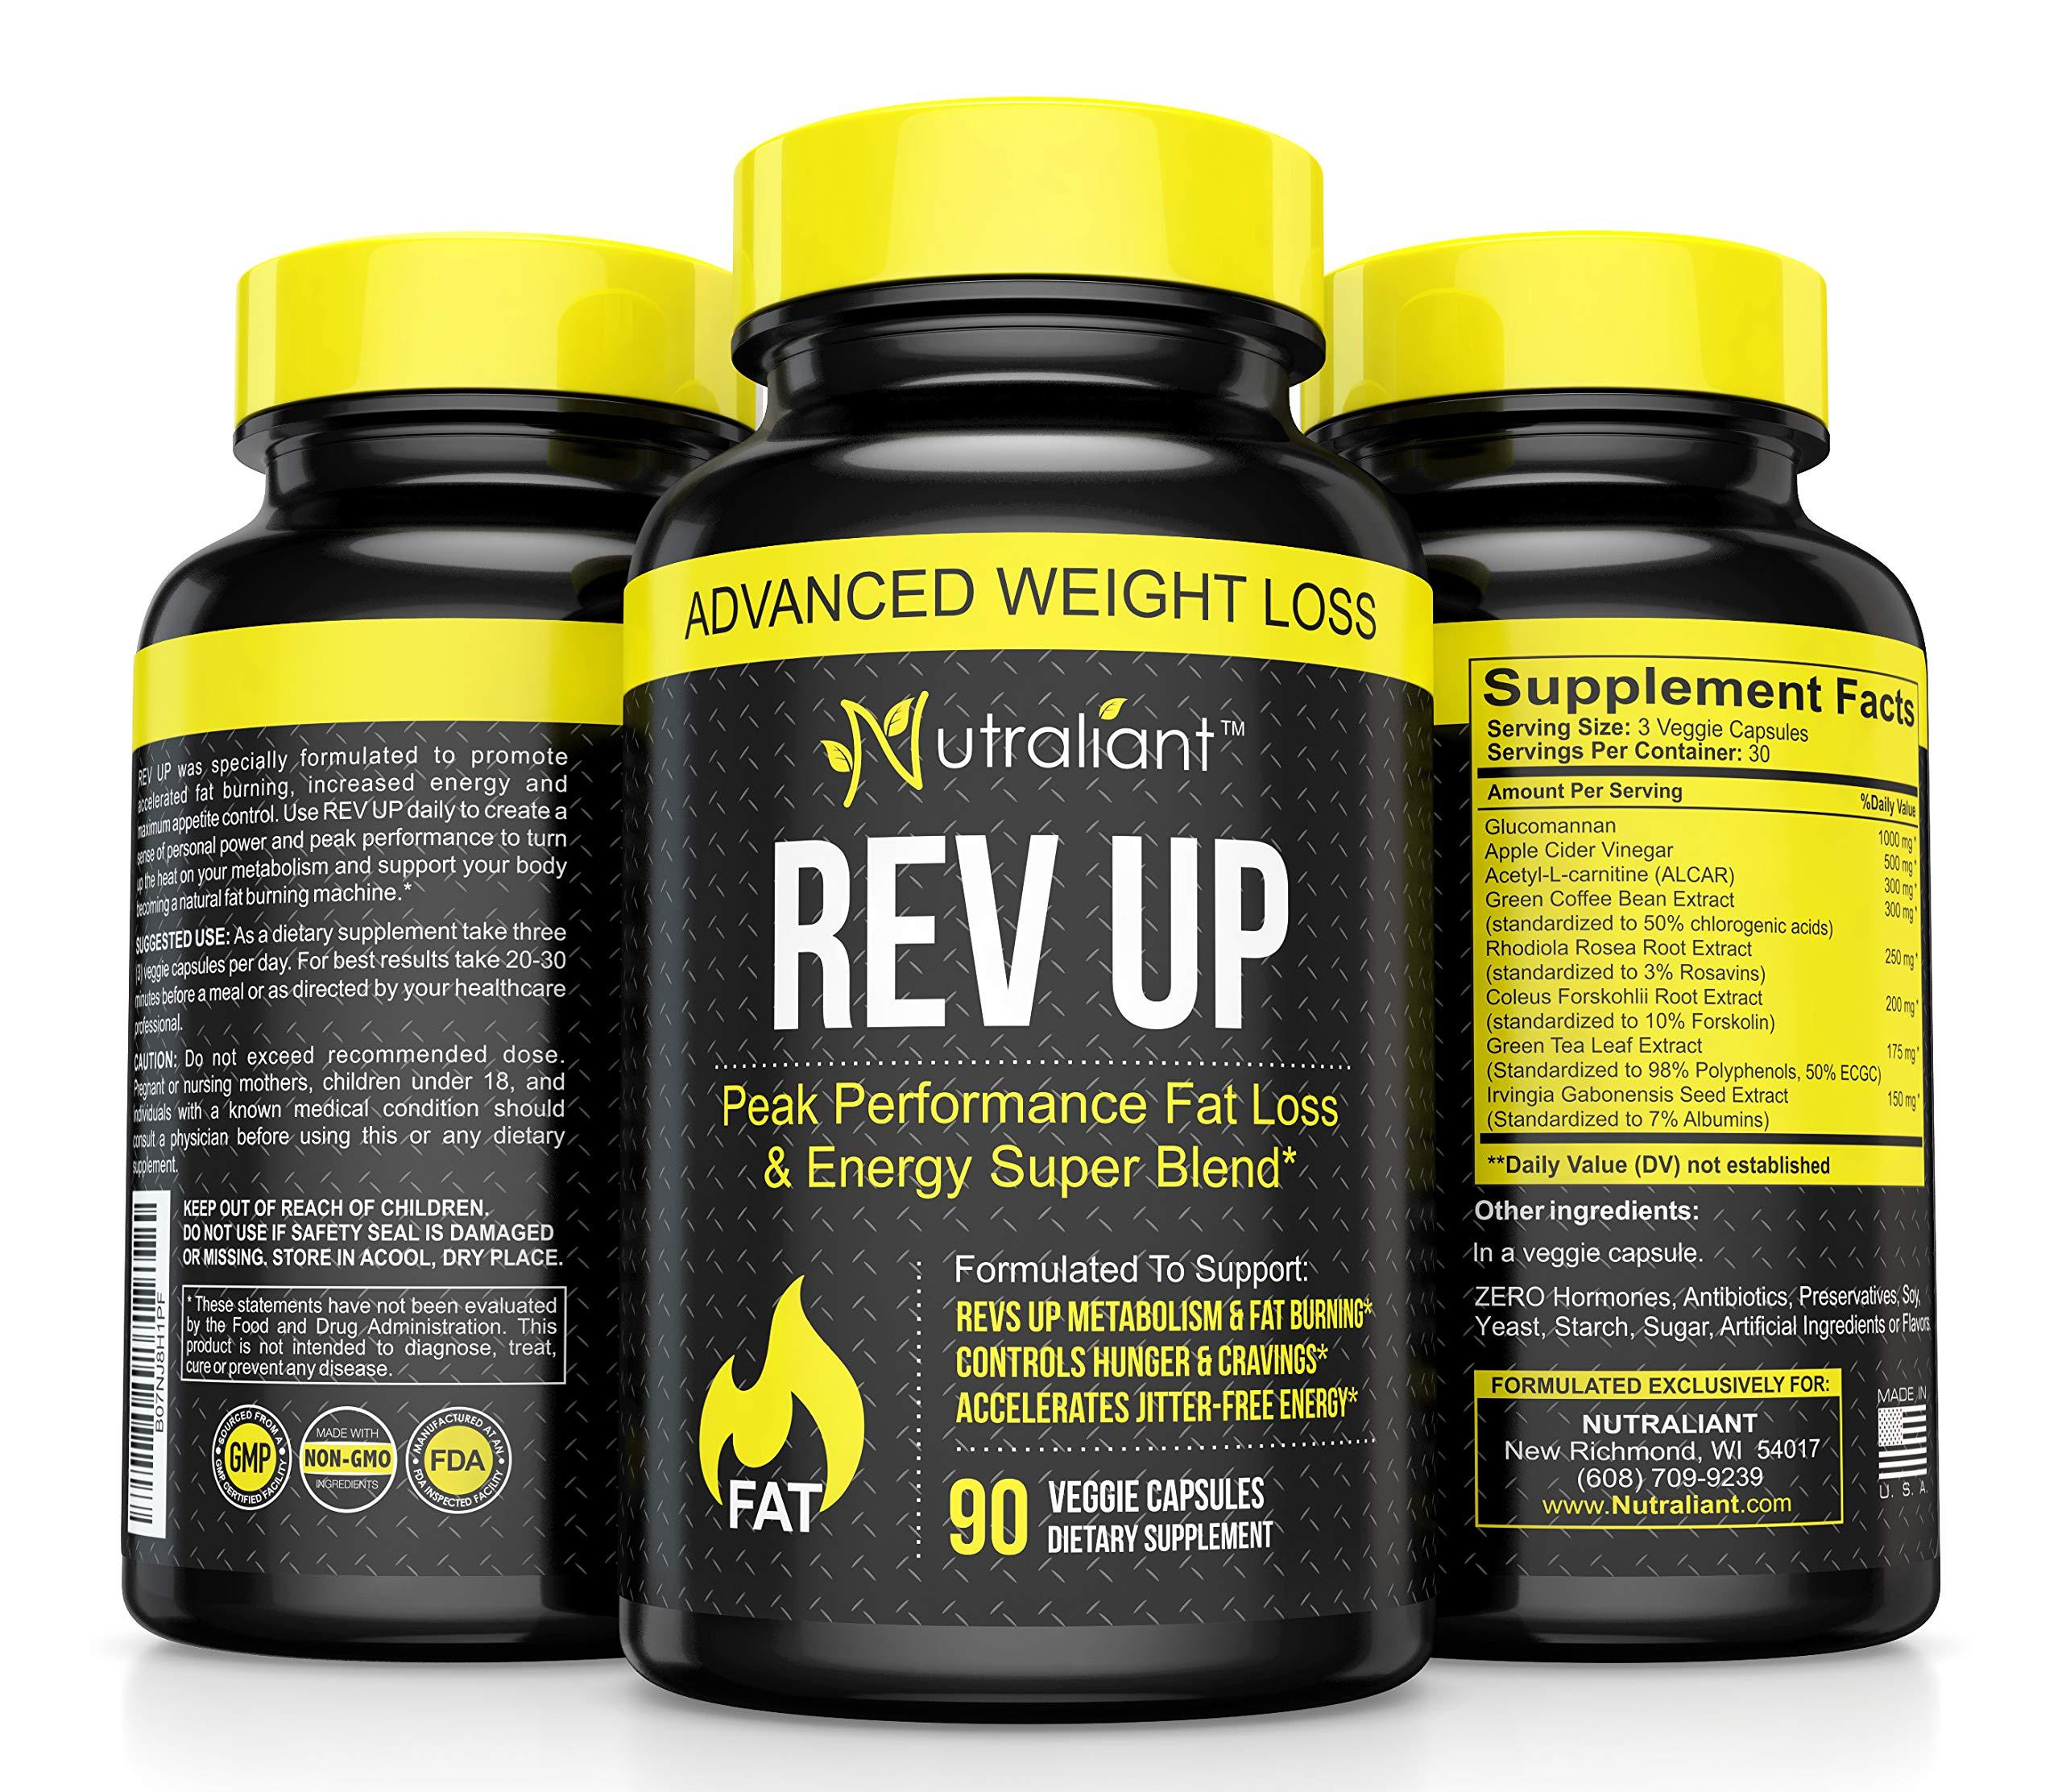 #1 Fat Burner Pills for Men & Women Thermogenic Supplement + Glucomannan, Apple Cider Vinegar, Acetyl L-Carnitine, Green Tea + Best Weight Loss Appetite Suppressant, Detox, Energy + Belly Fat Burners